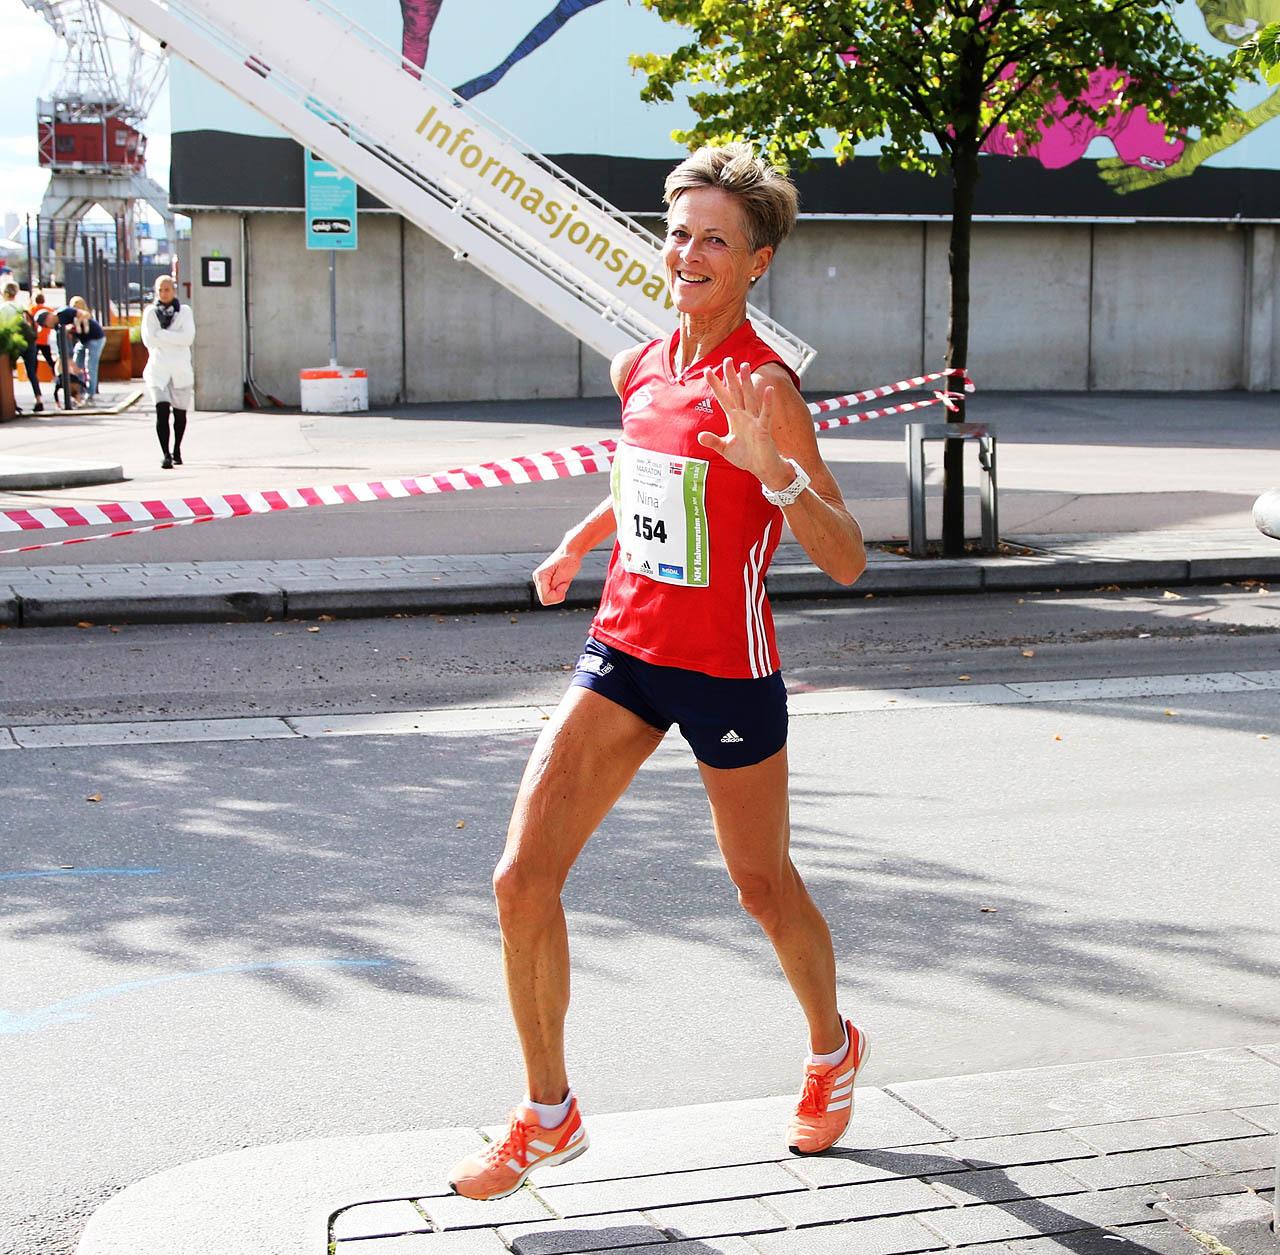 Nina_Ytterstad_Wavik_Oslo_Maraton_halv_2017_foto_Runar_Gilberg_4S7A3362.jpg